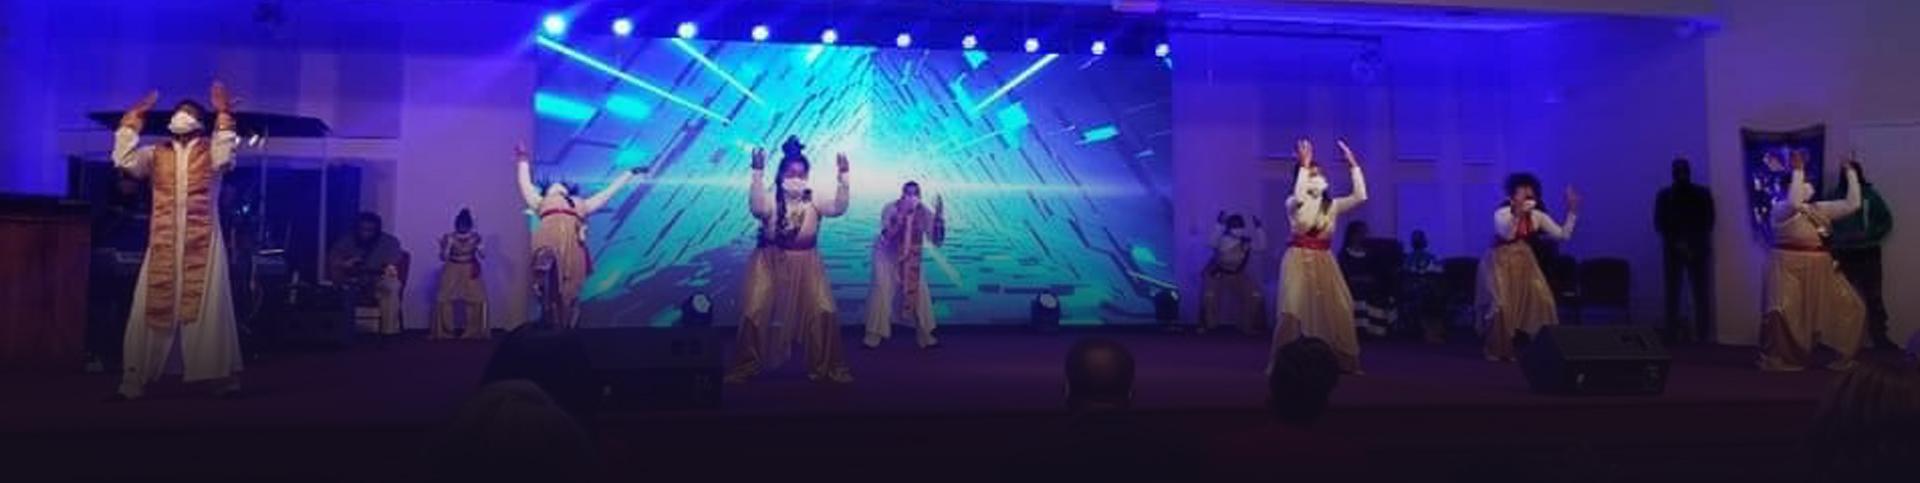 Praise dance team on stage praise dancing